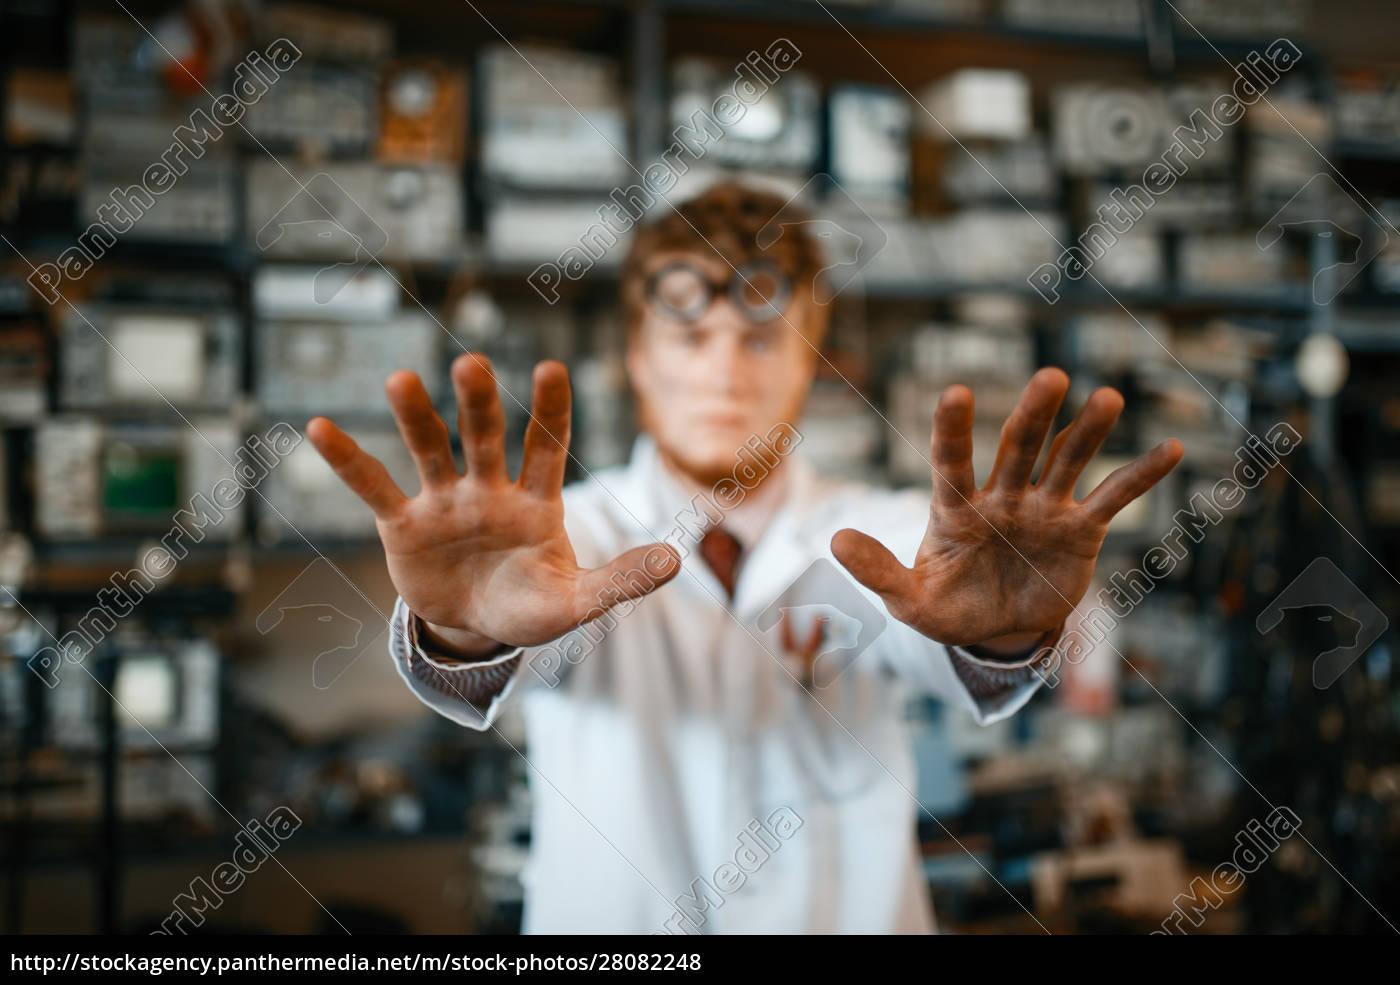 strange, scientist, showing, scorched, hands, in - 28082248